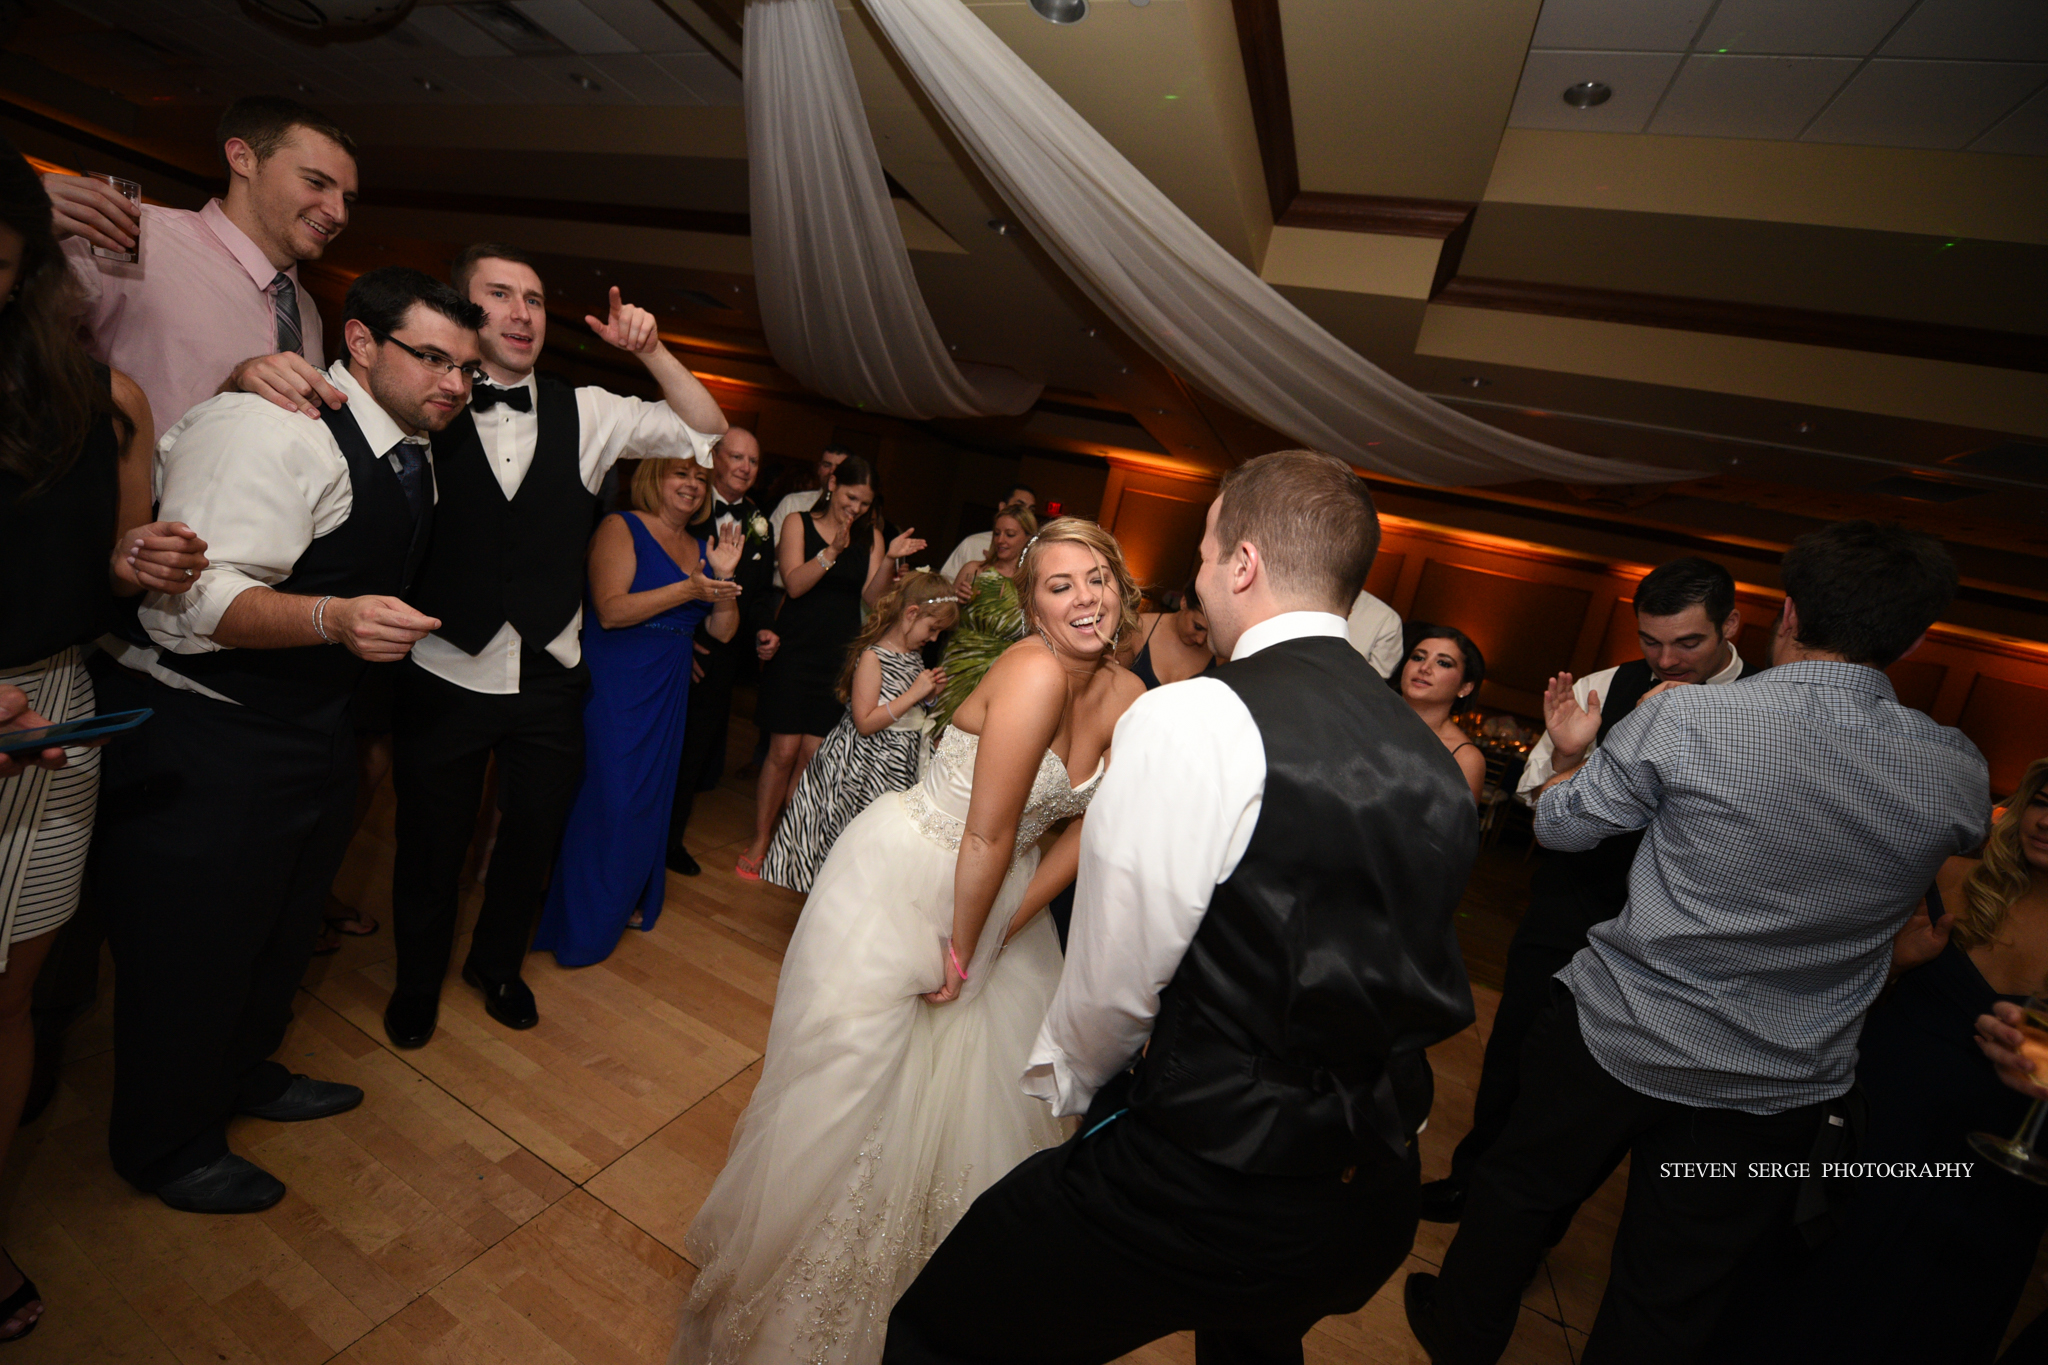 scranton-wedding-photographers-hilton-steven-serge-photography-43.jpg